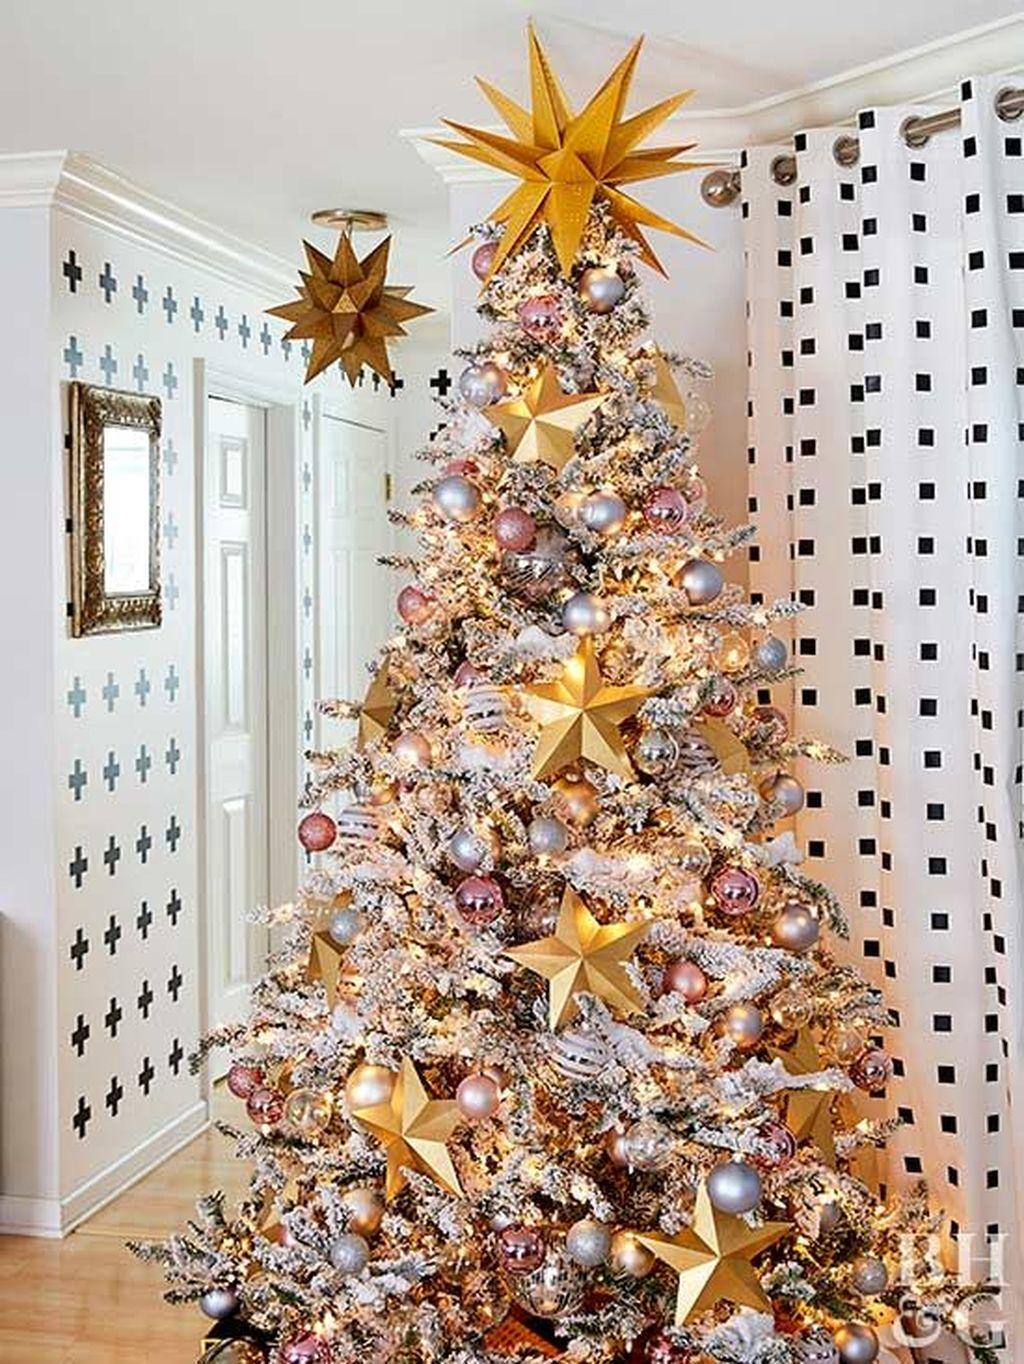 Amazing Winter Christmas Tree Design And Decor Ideas 17